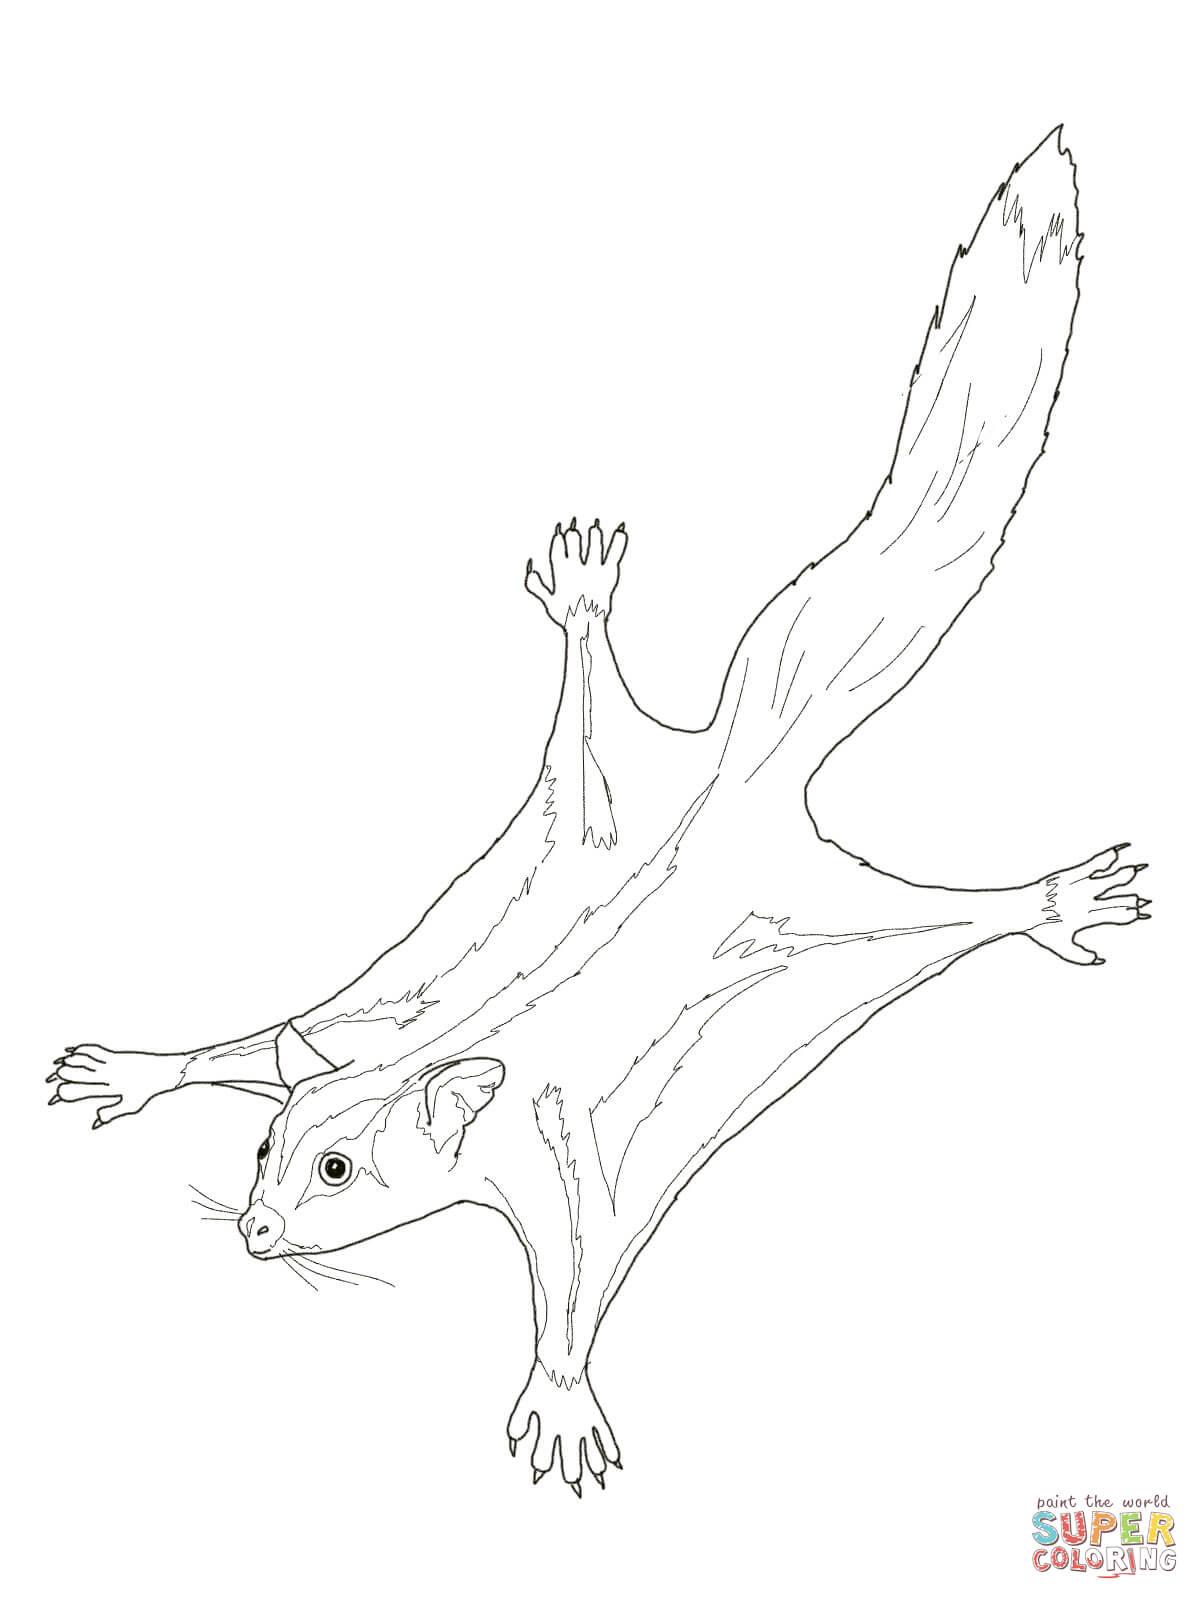 Cuscus coloring #11, Download drawings